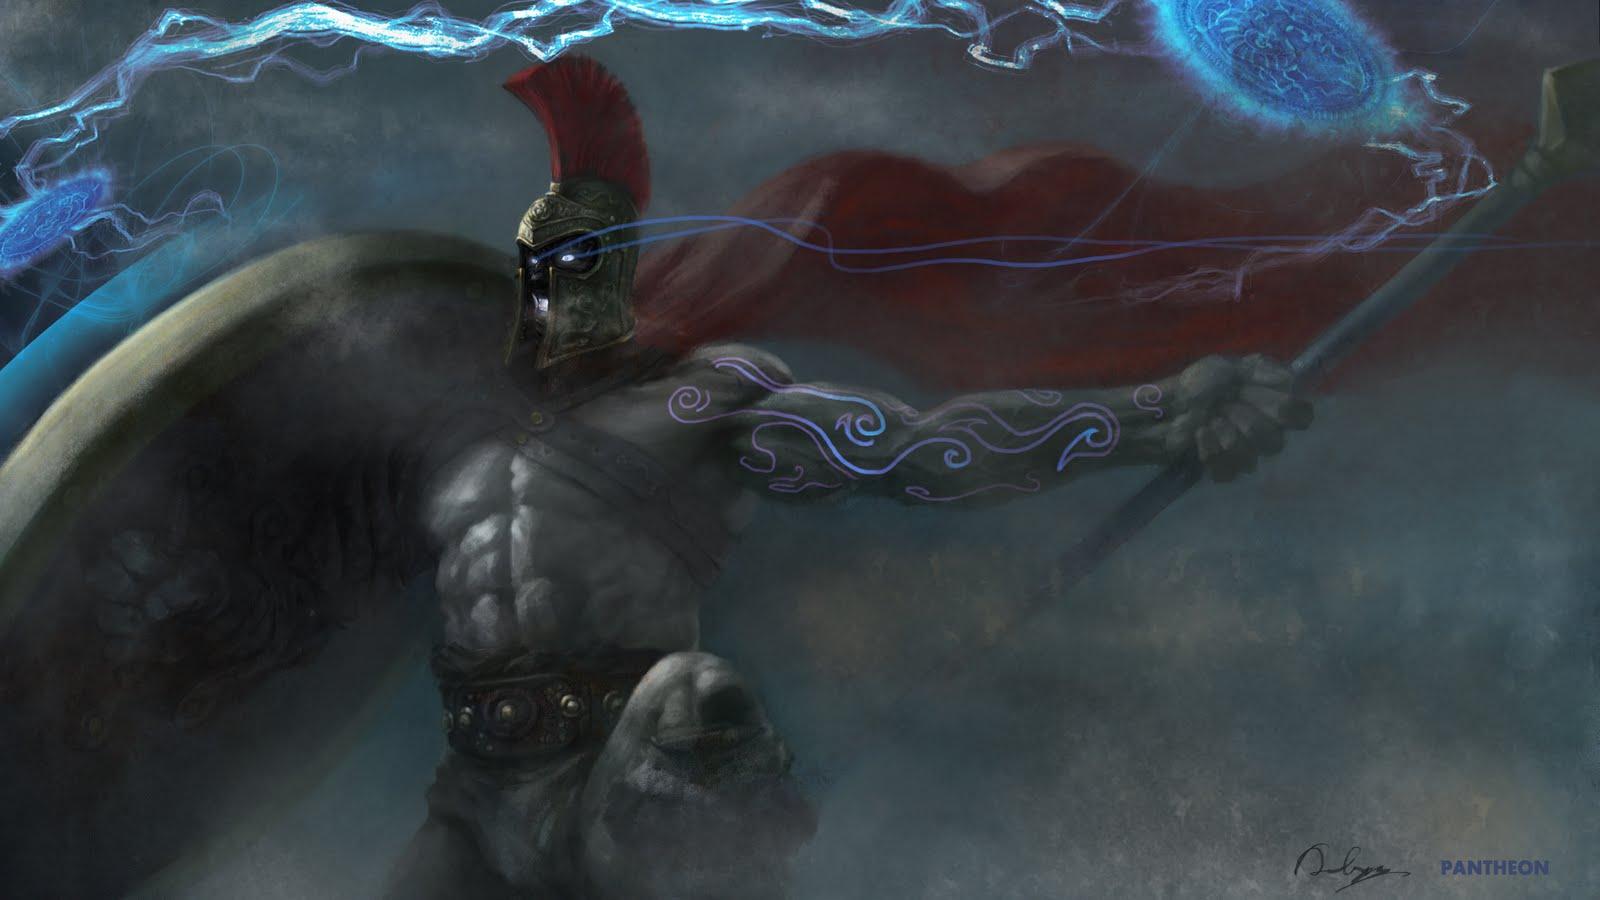 lol壁纸 英雄联盟 魔战士设计图 动漫人物 动漫动画 高清图片